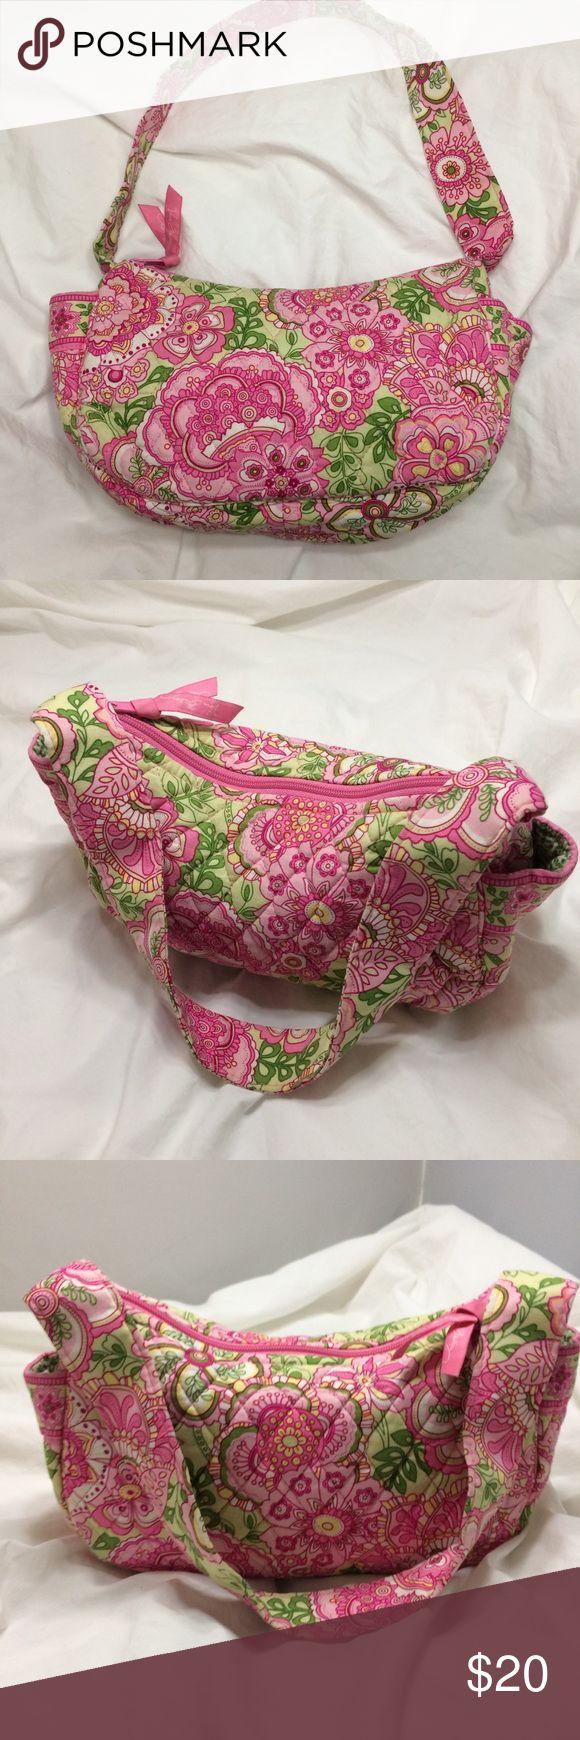 Vera Bradley Handbag Vera Bradley Handbag Multi Floral Print Pink & Green Vera Bradley Bags Satchels